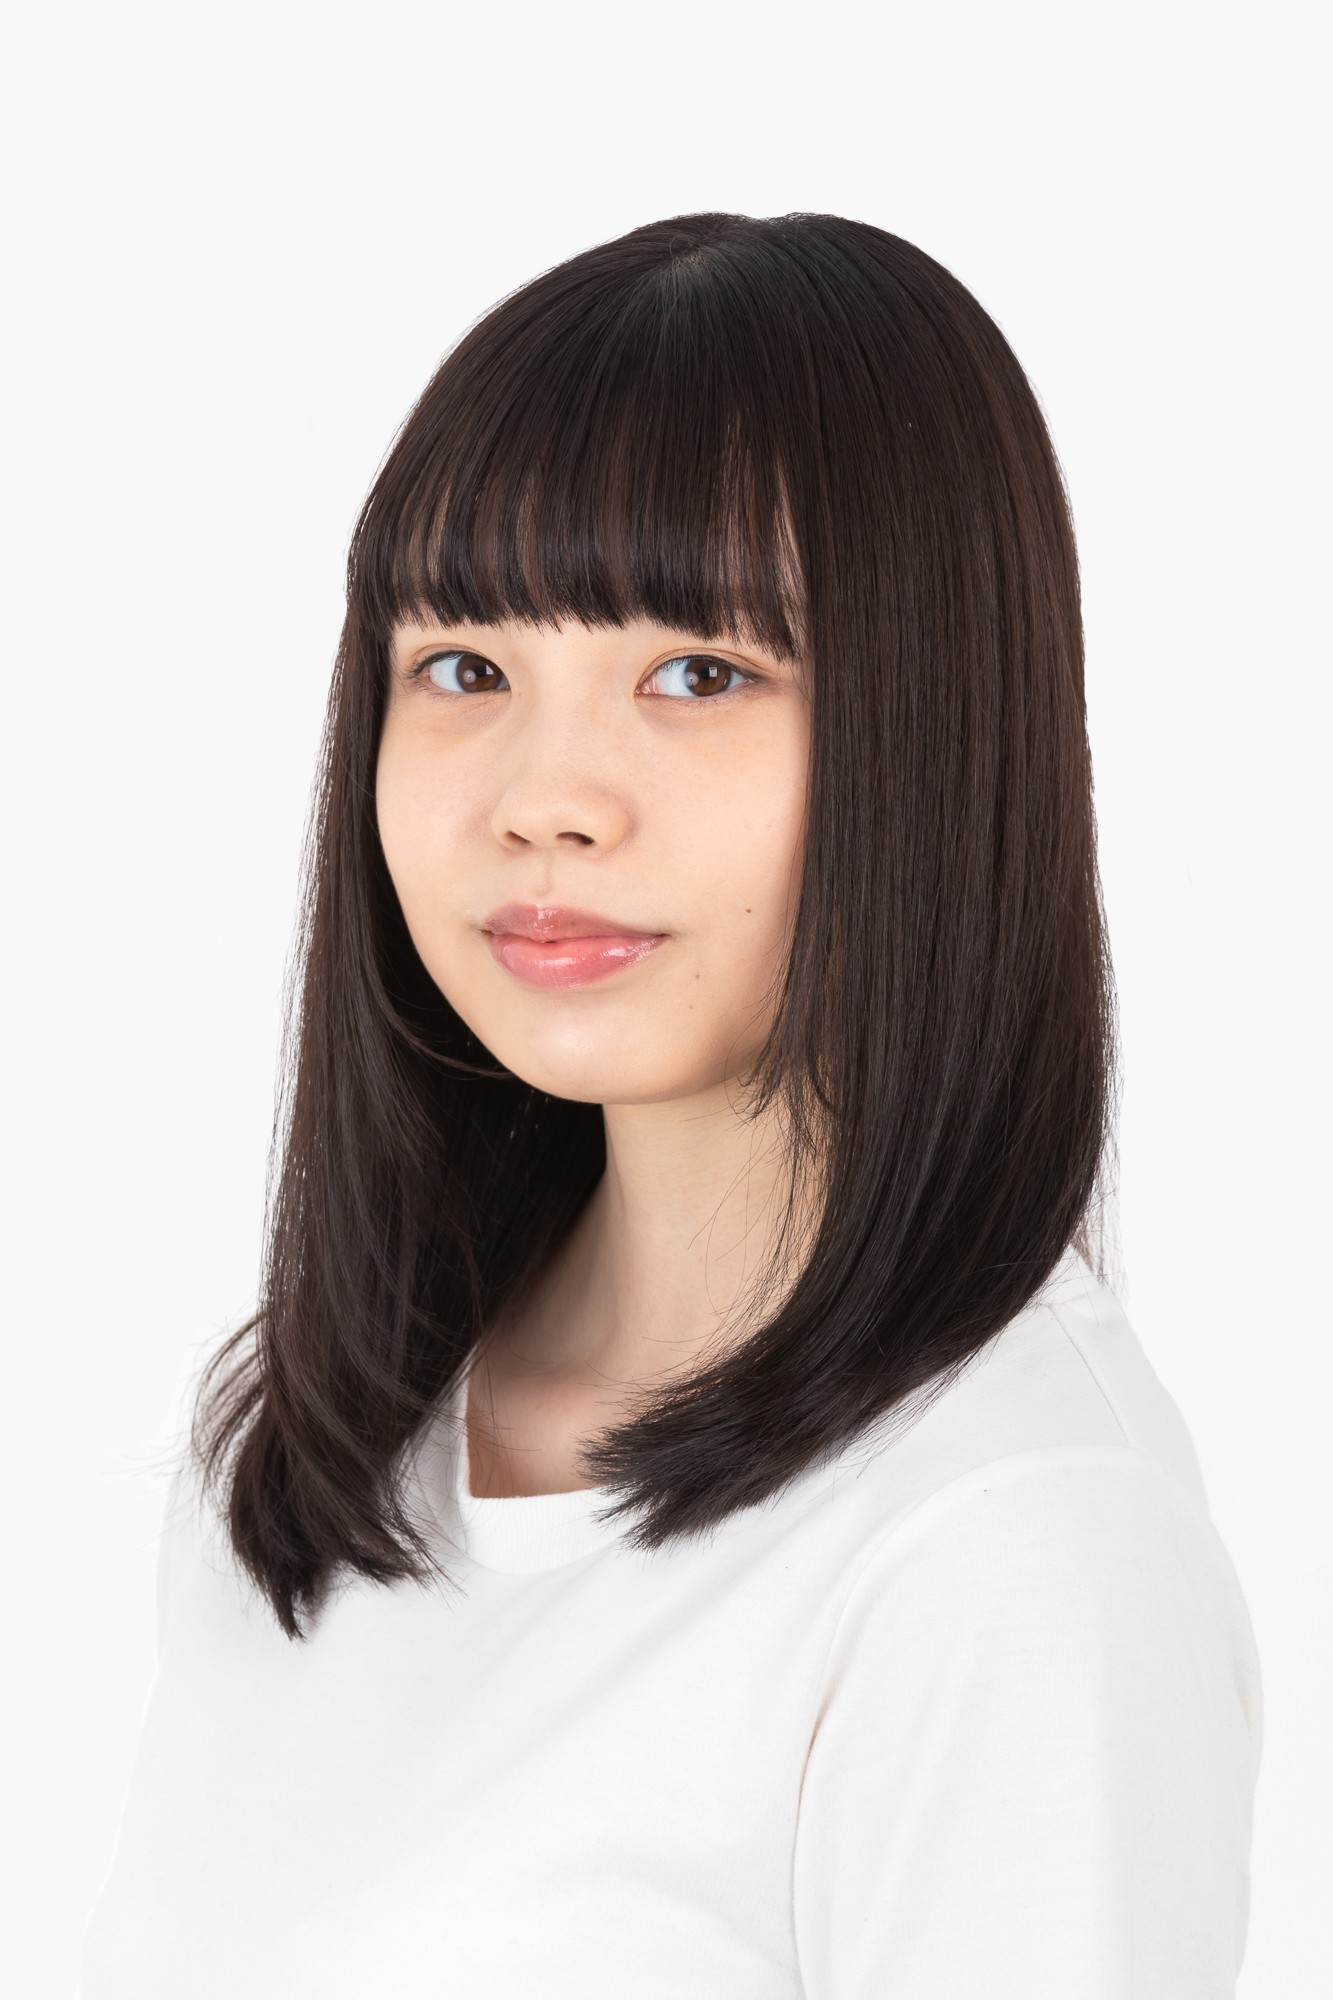 小野彩香,OnoAyaka